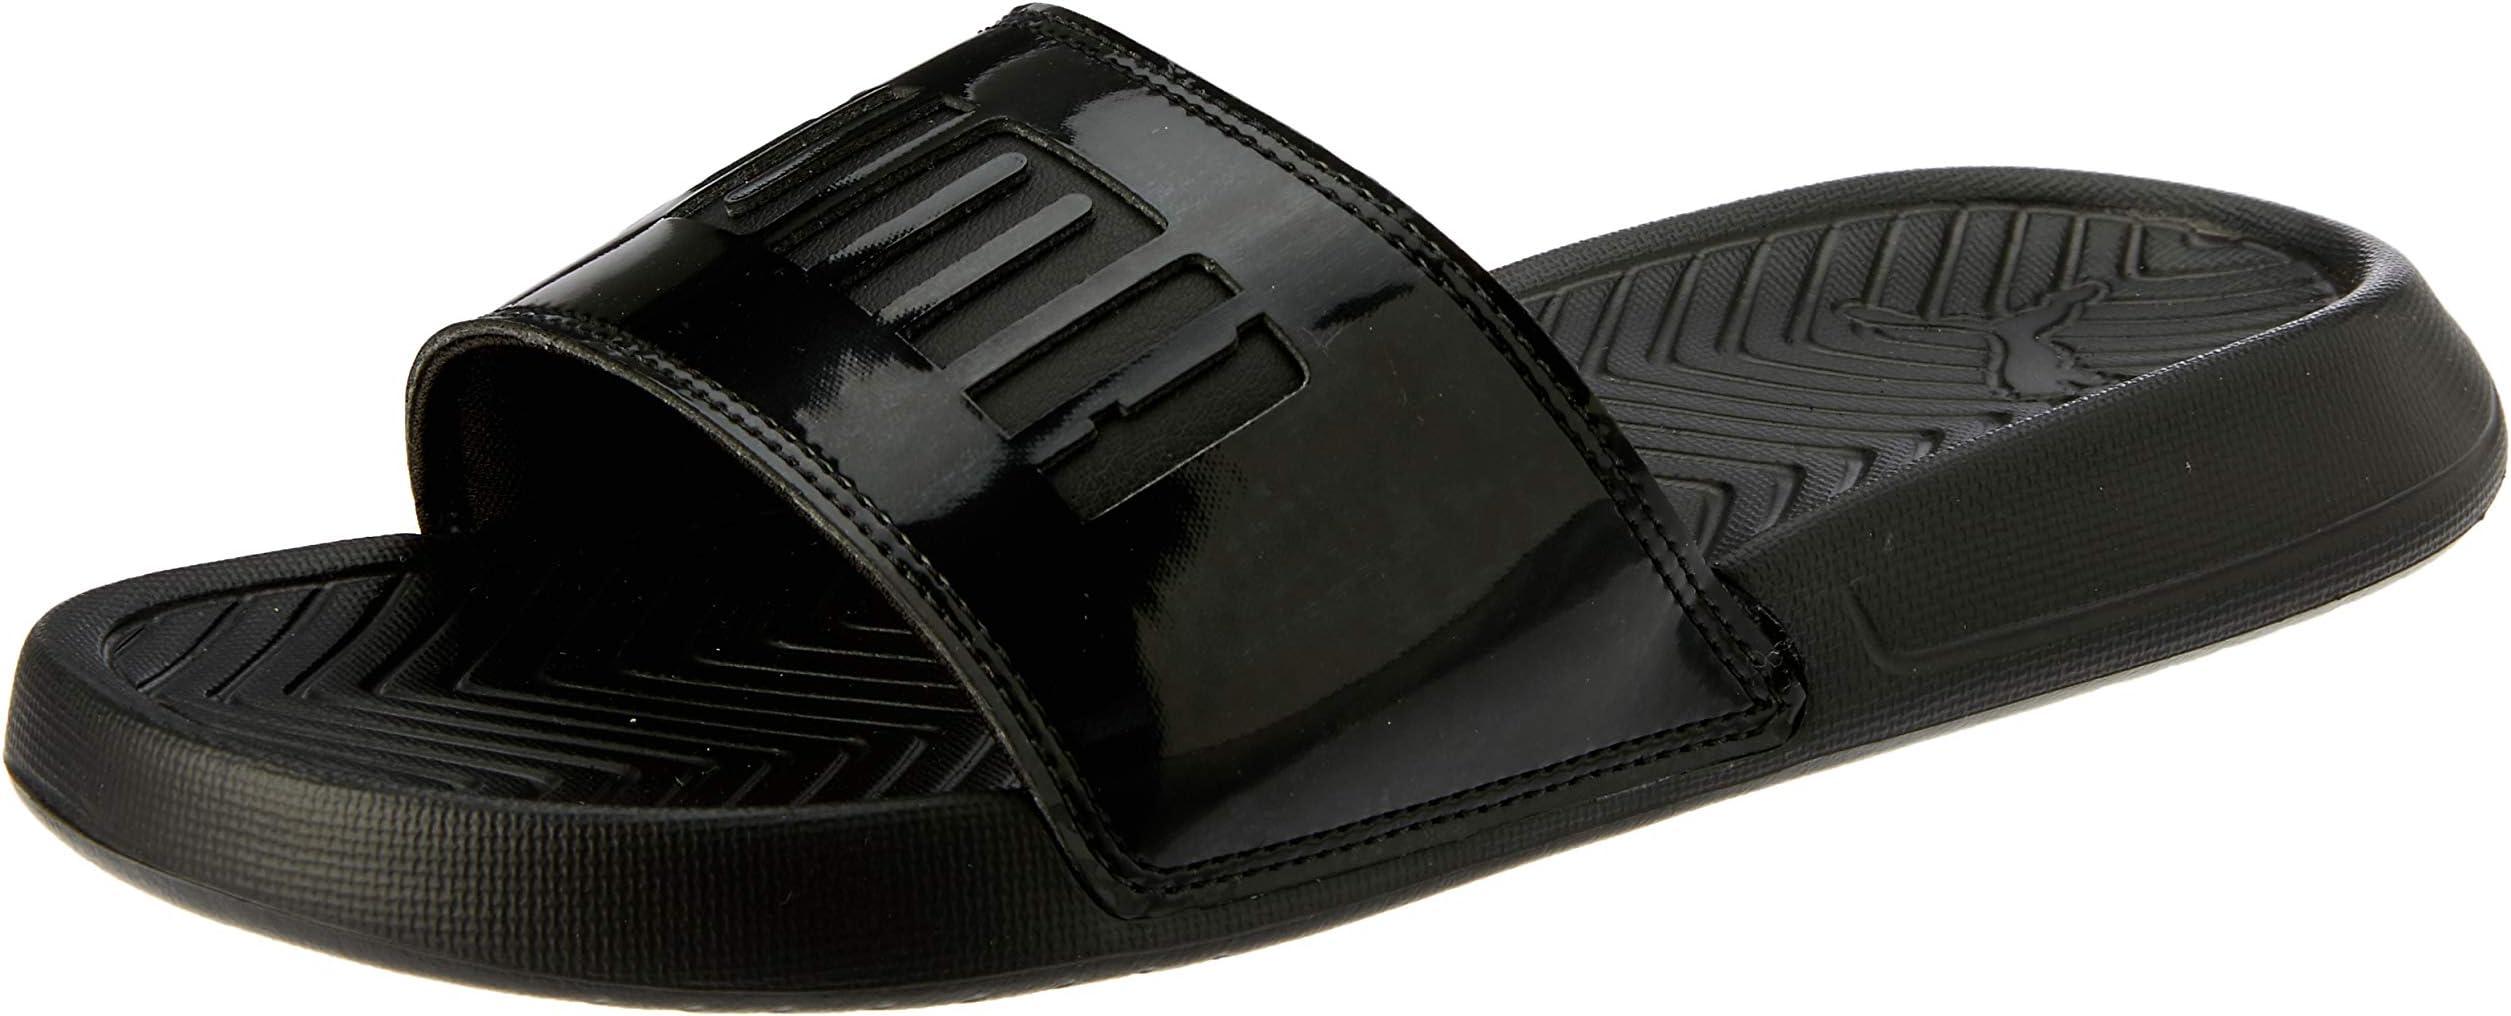 Puma Popcat Patent Sandal For Women